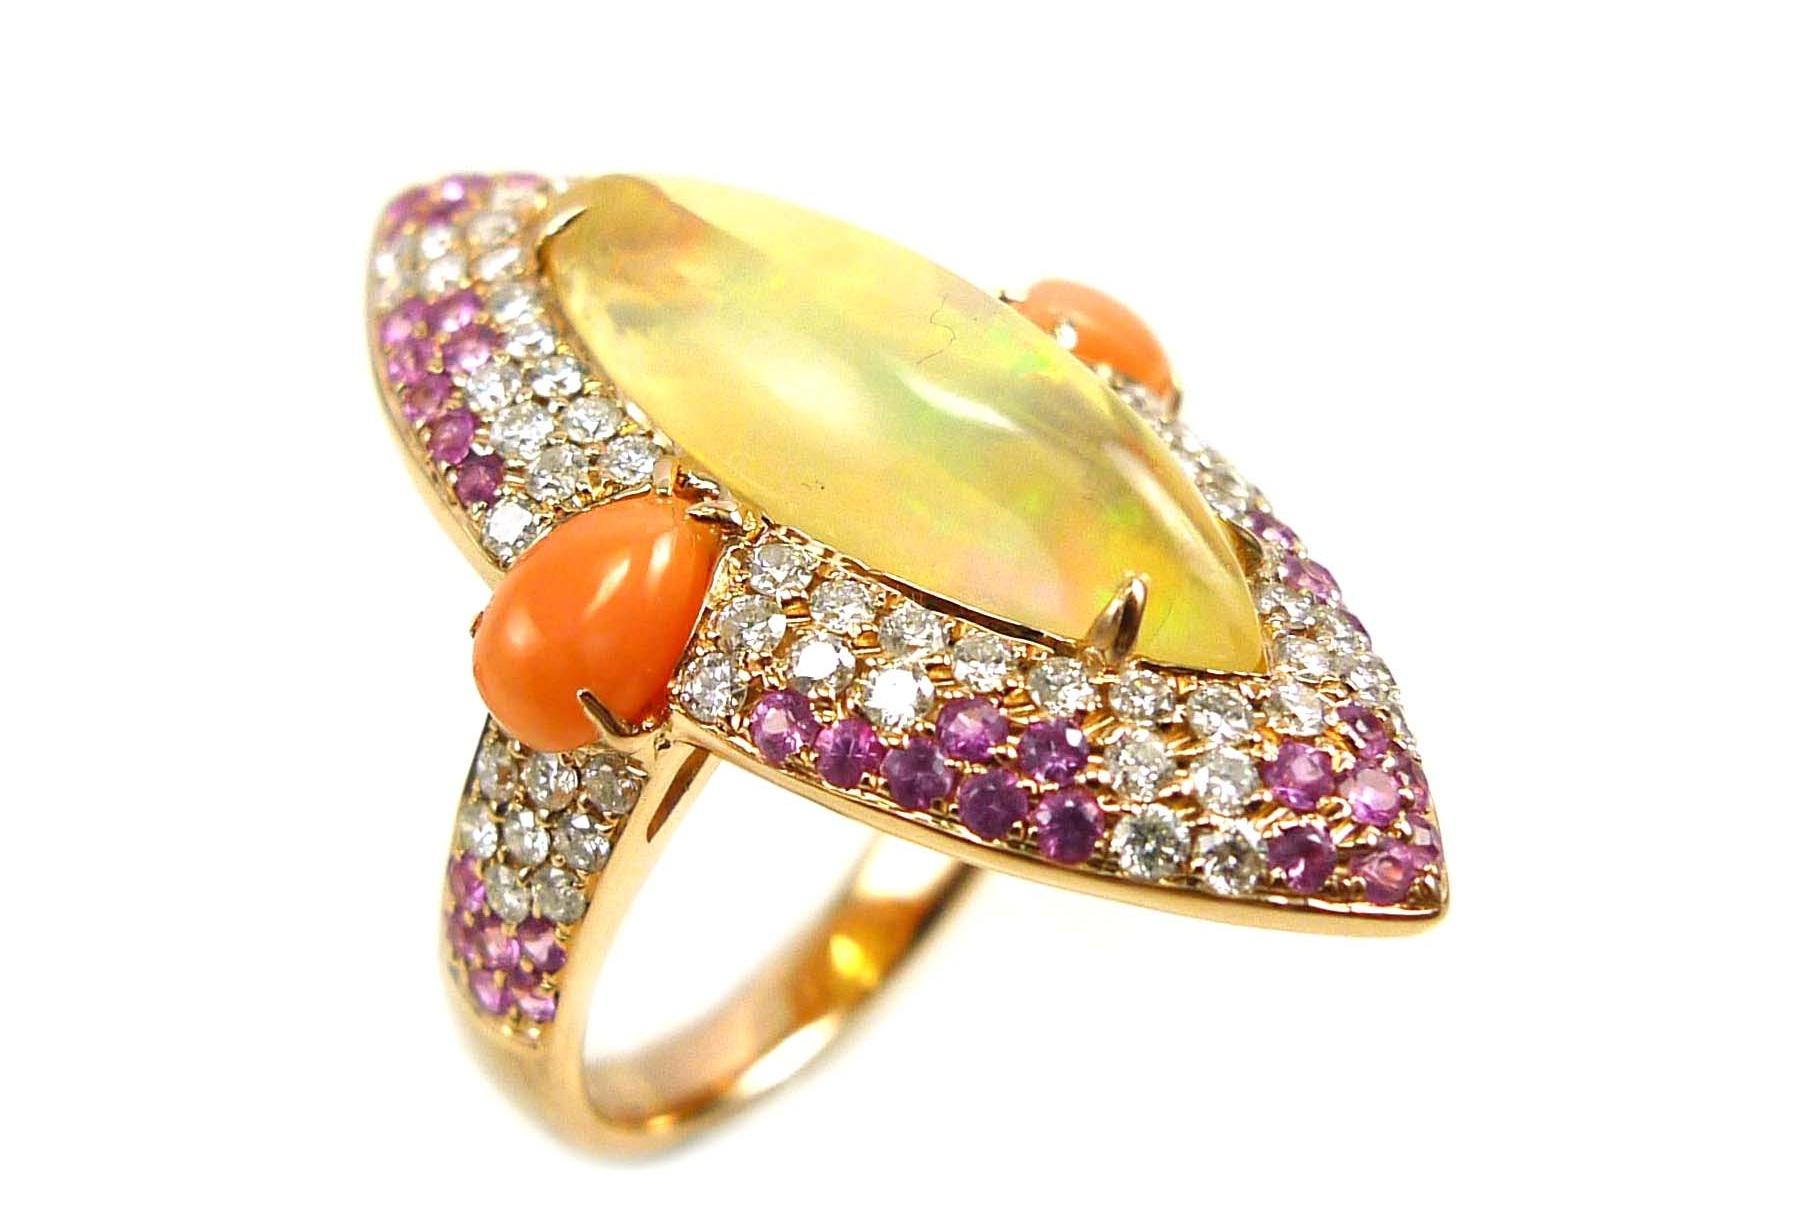 Stones:   -White Diamond Round Full Cut  -Ethiopian Opal  -Peach Coral  -Pink Sapphire